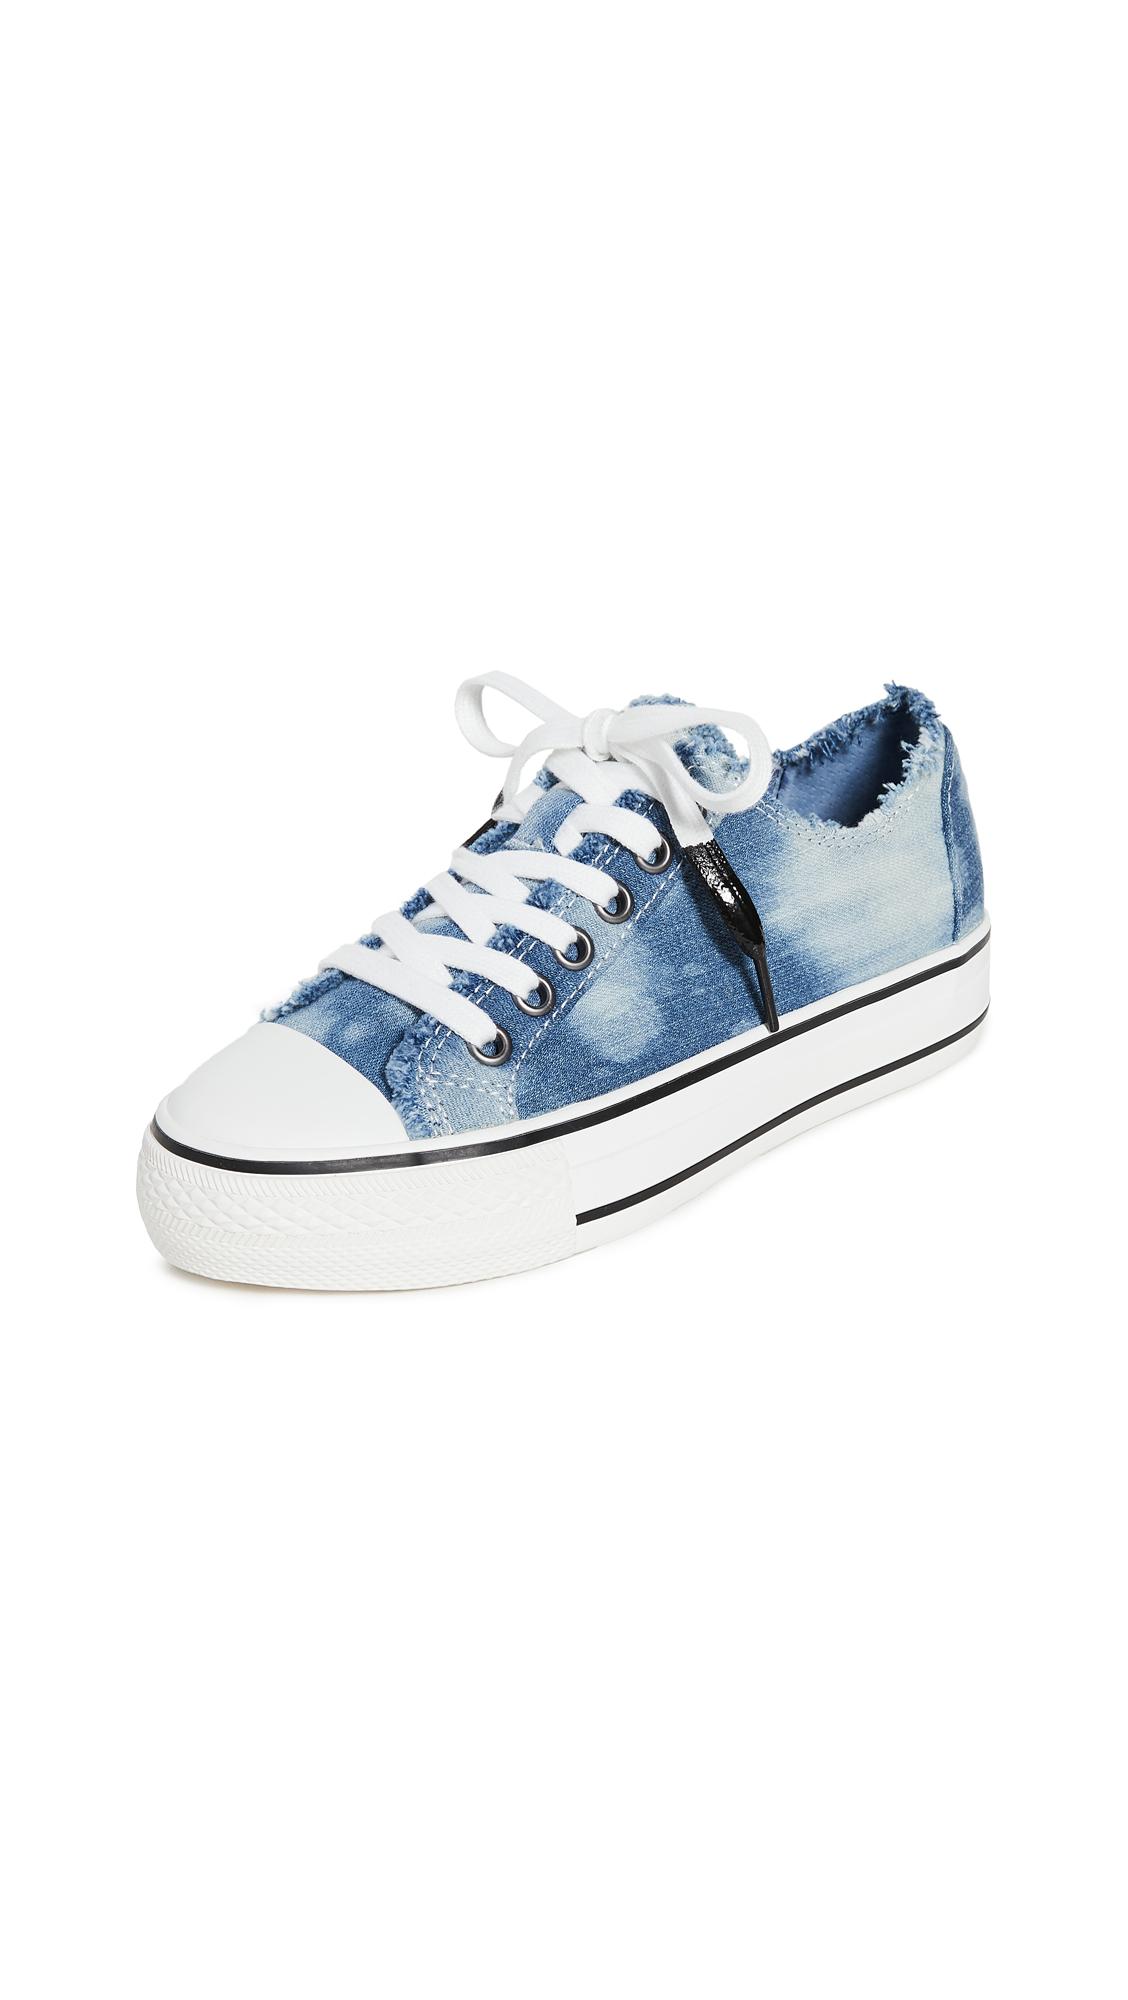 Buy Ash Viki Bis Sneakers online, shop Ash